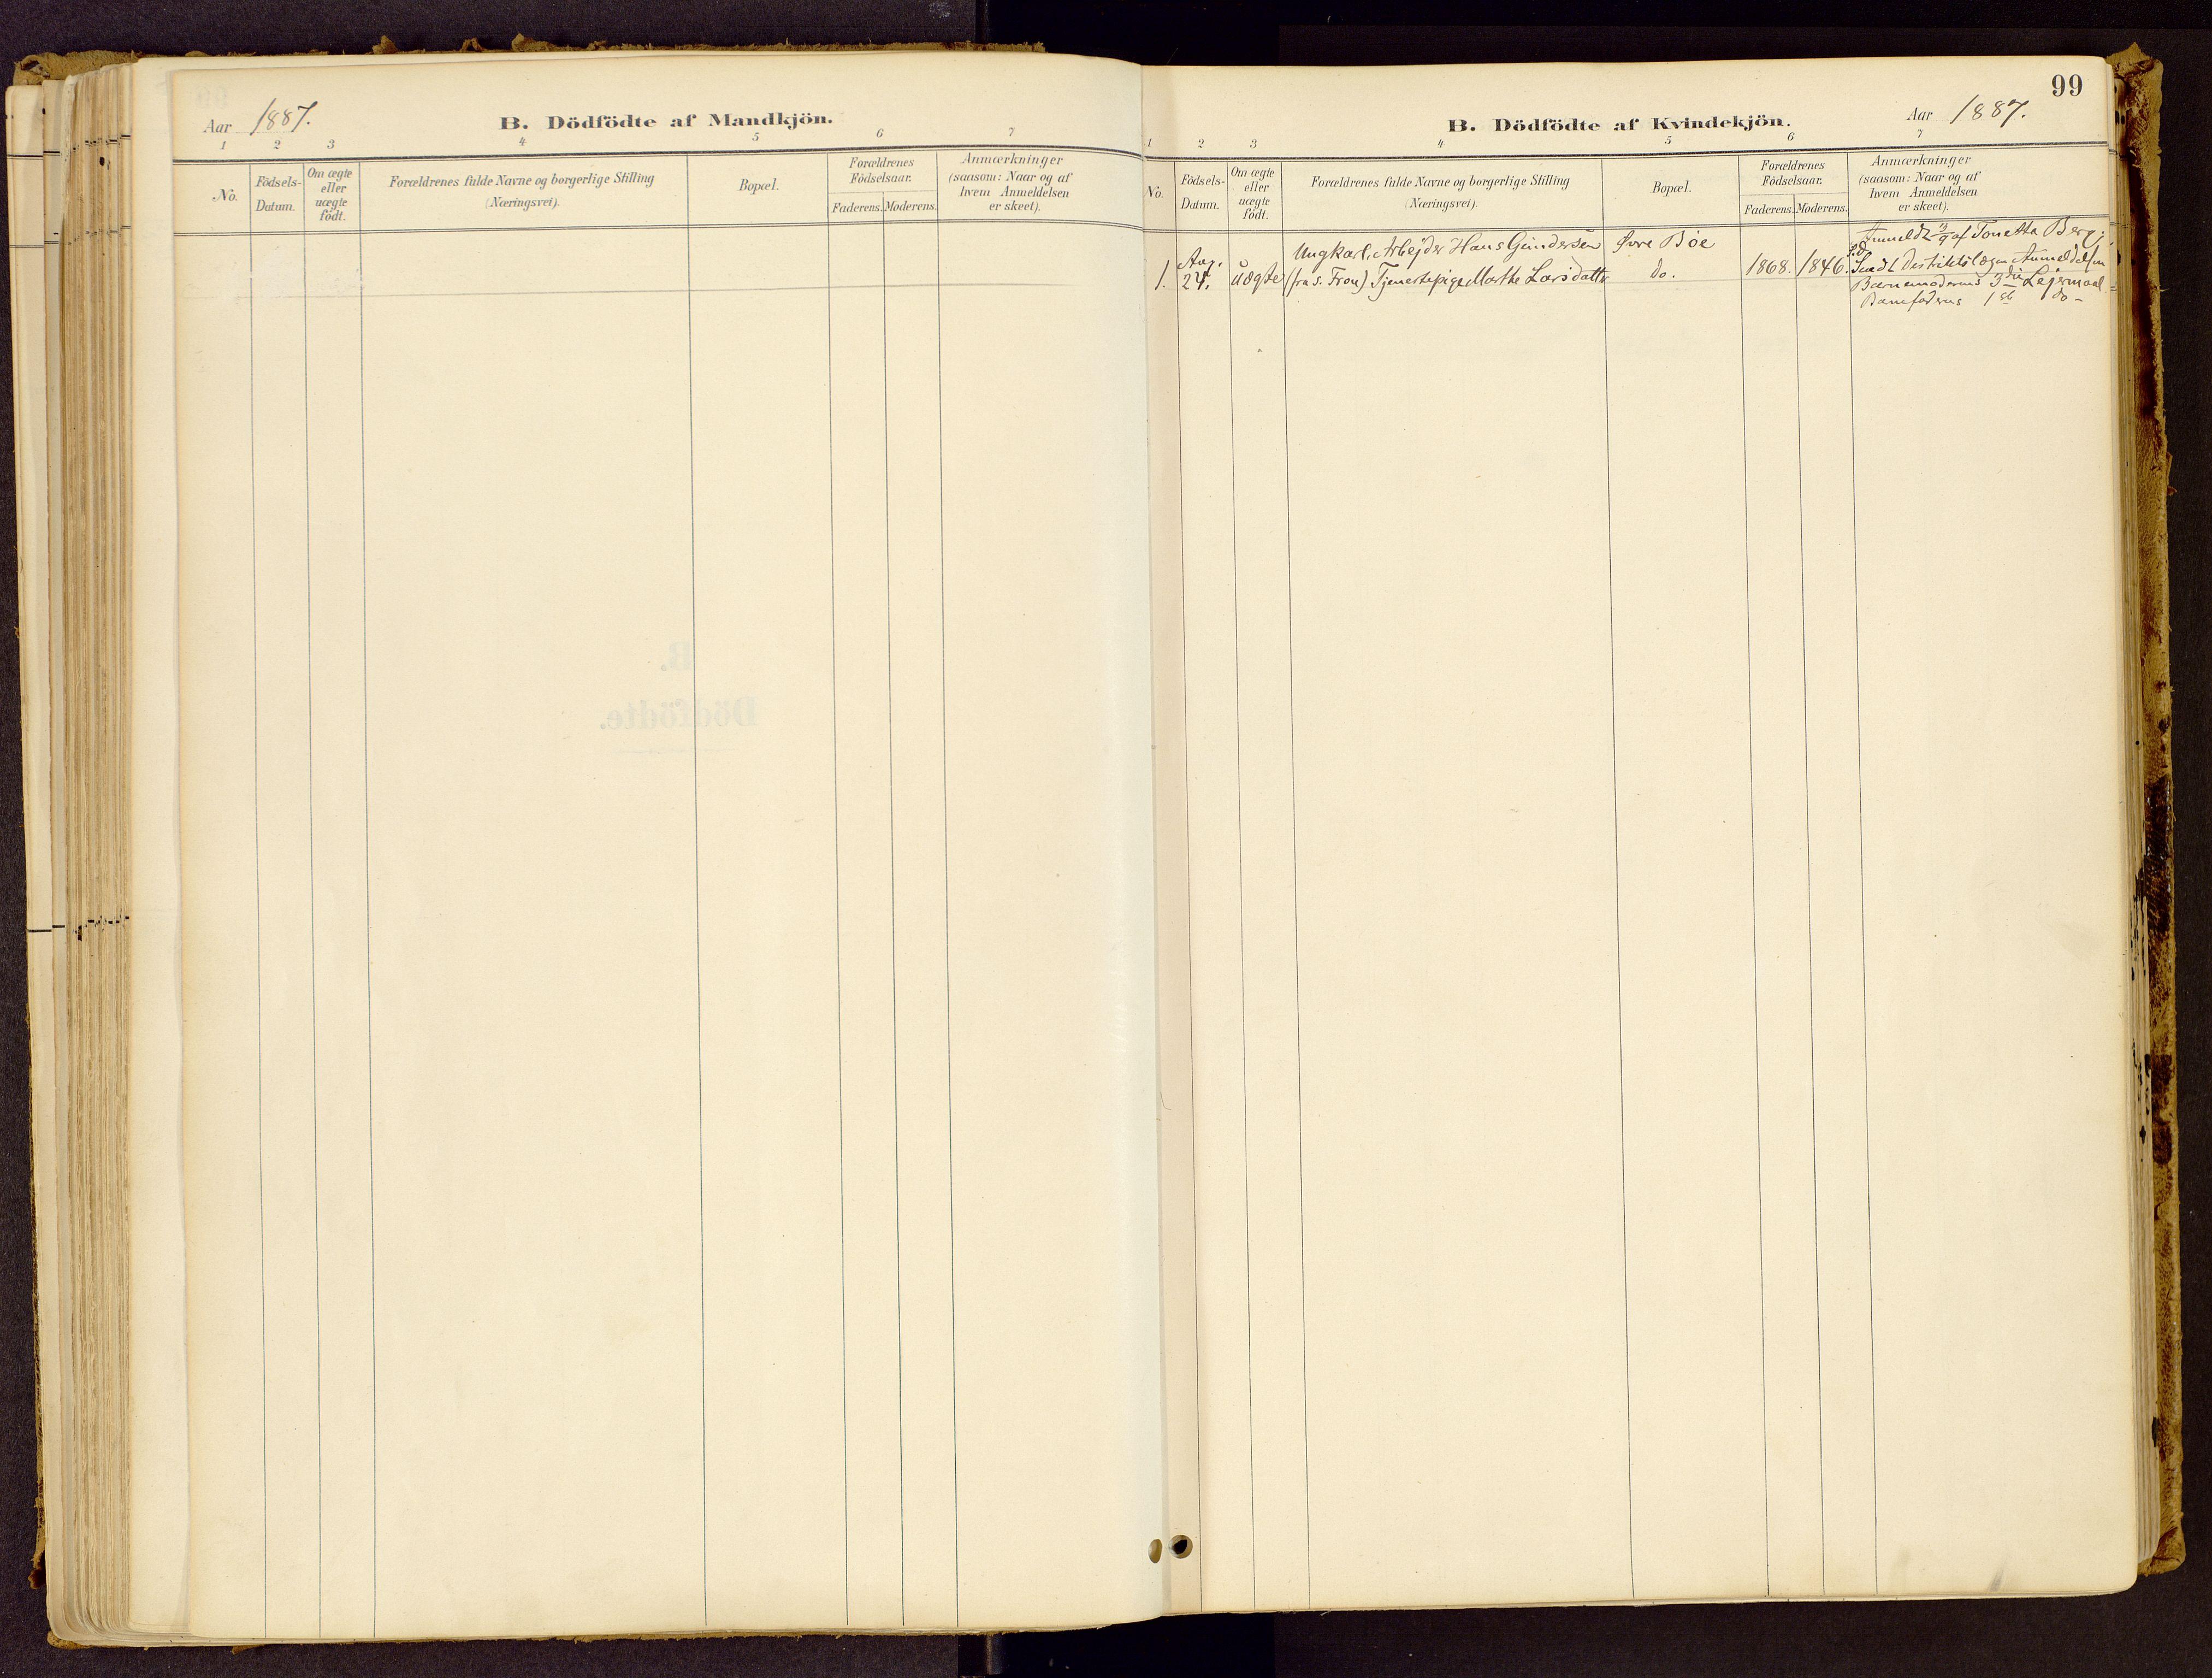 SAH, Vestre Gausdal prestekontor, Ministerialbok nr. 1, 1887-1914, s. 99